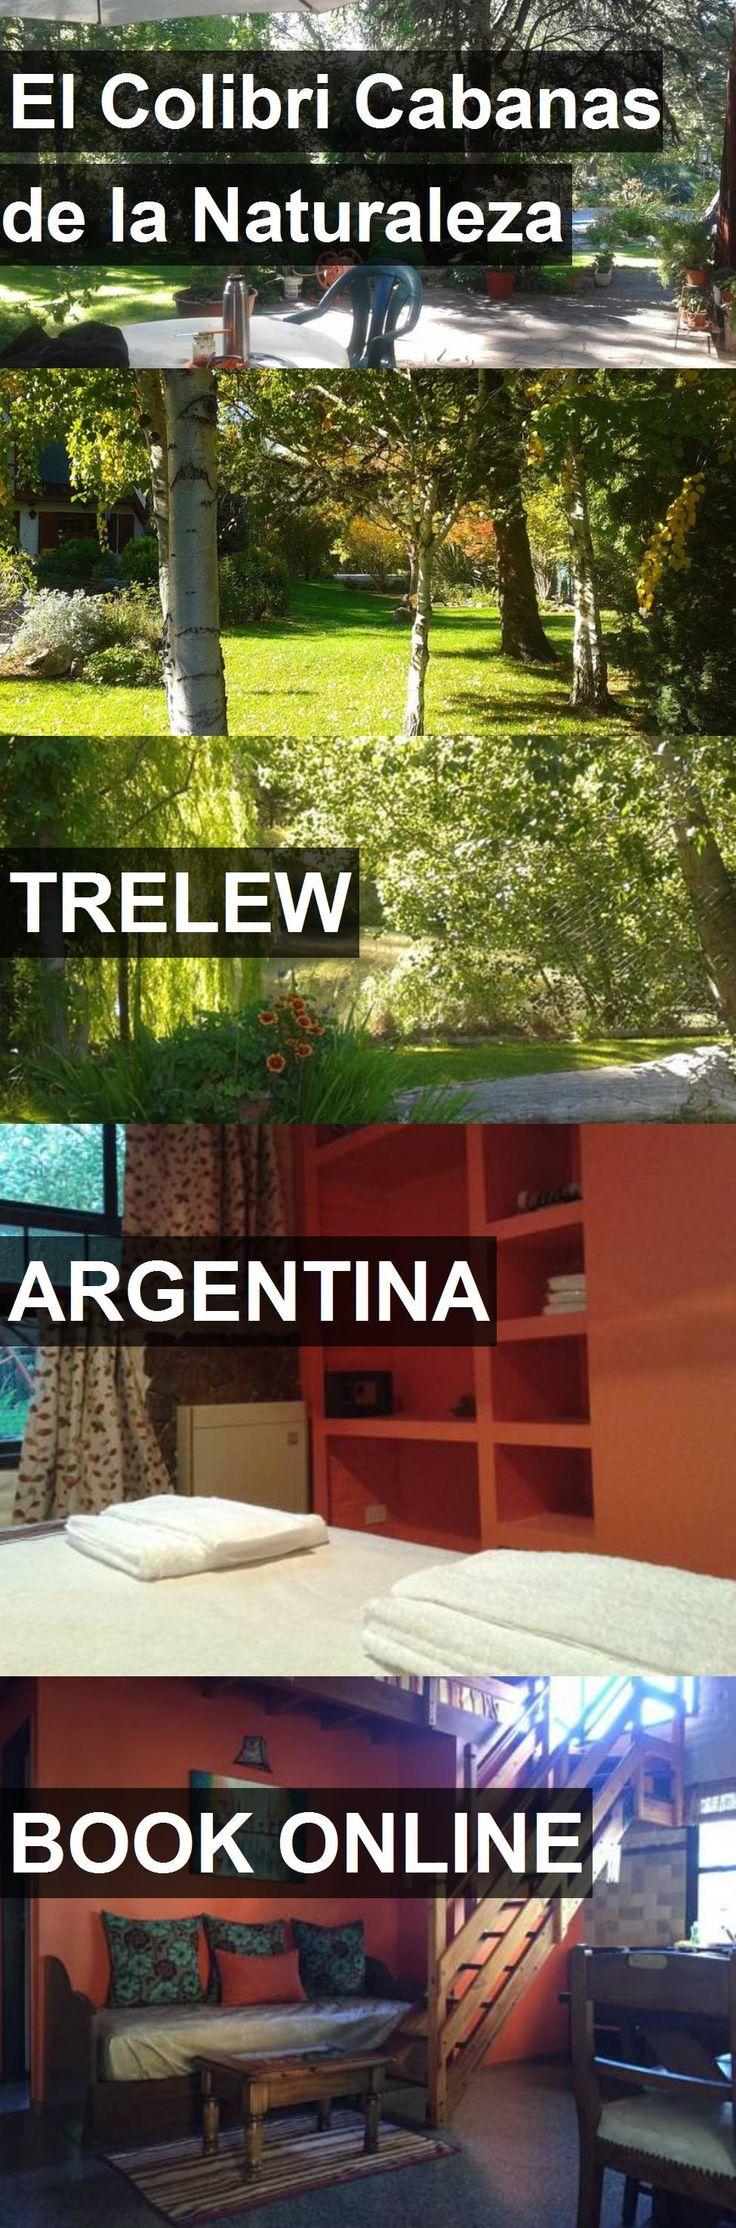 Hotel El Colibri Cabanas de la Naturaleza in Trelew, Argentina. For more information, photos, reviews and best prices please follow the link. #Argentina #Trelew #travel #vacation #hotel